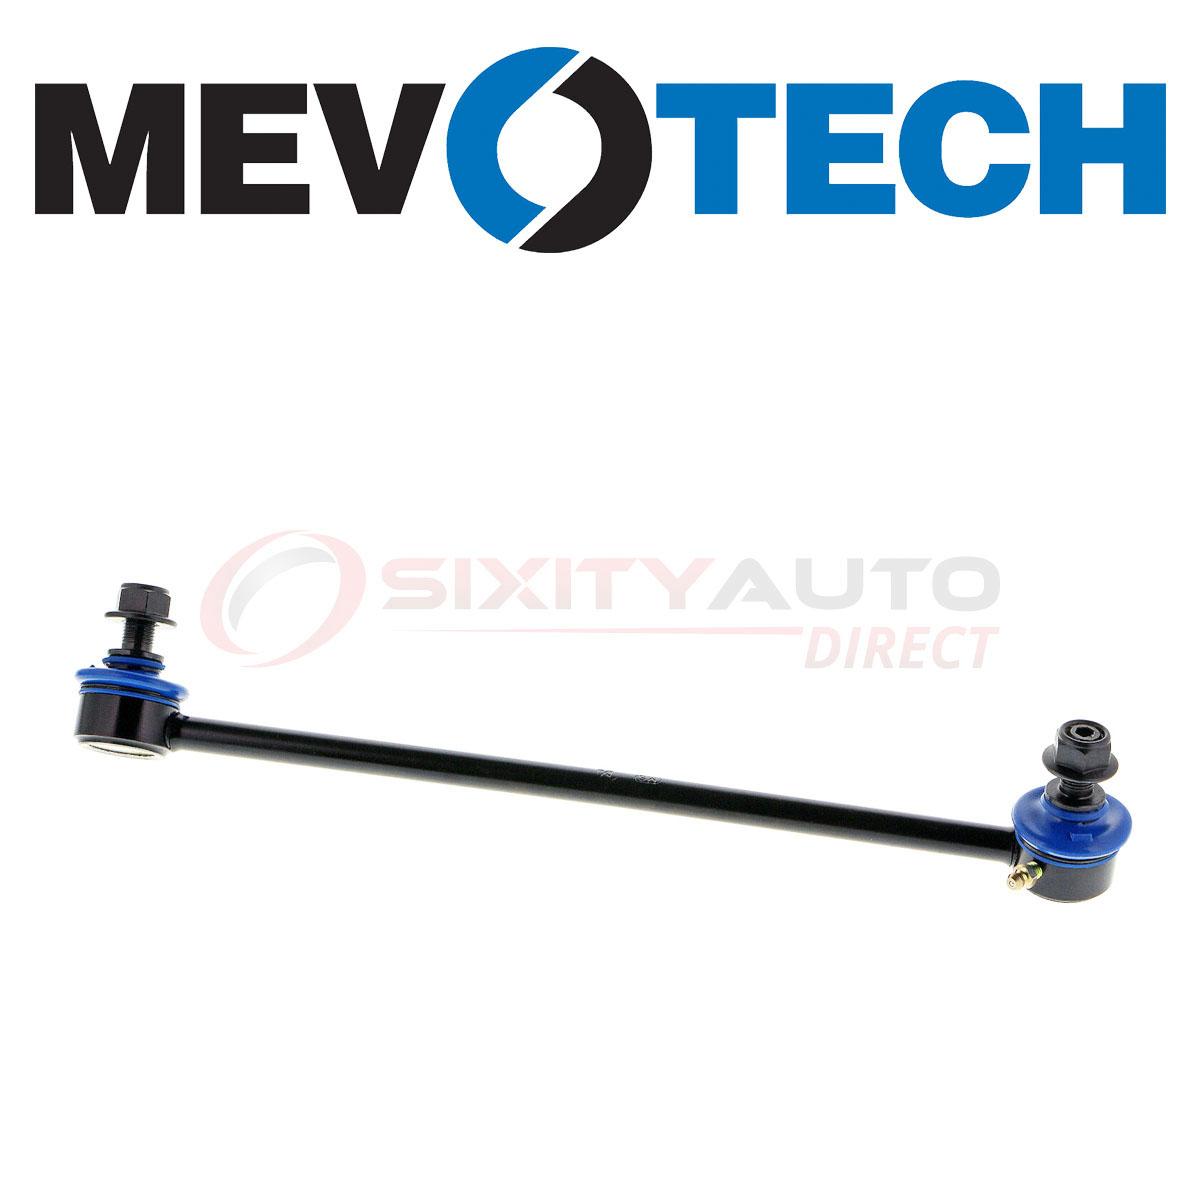 Mevotech Suspension Stabilizer Bar Link Kit For 2013-2016